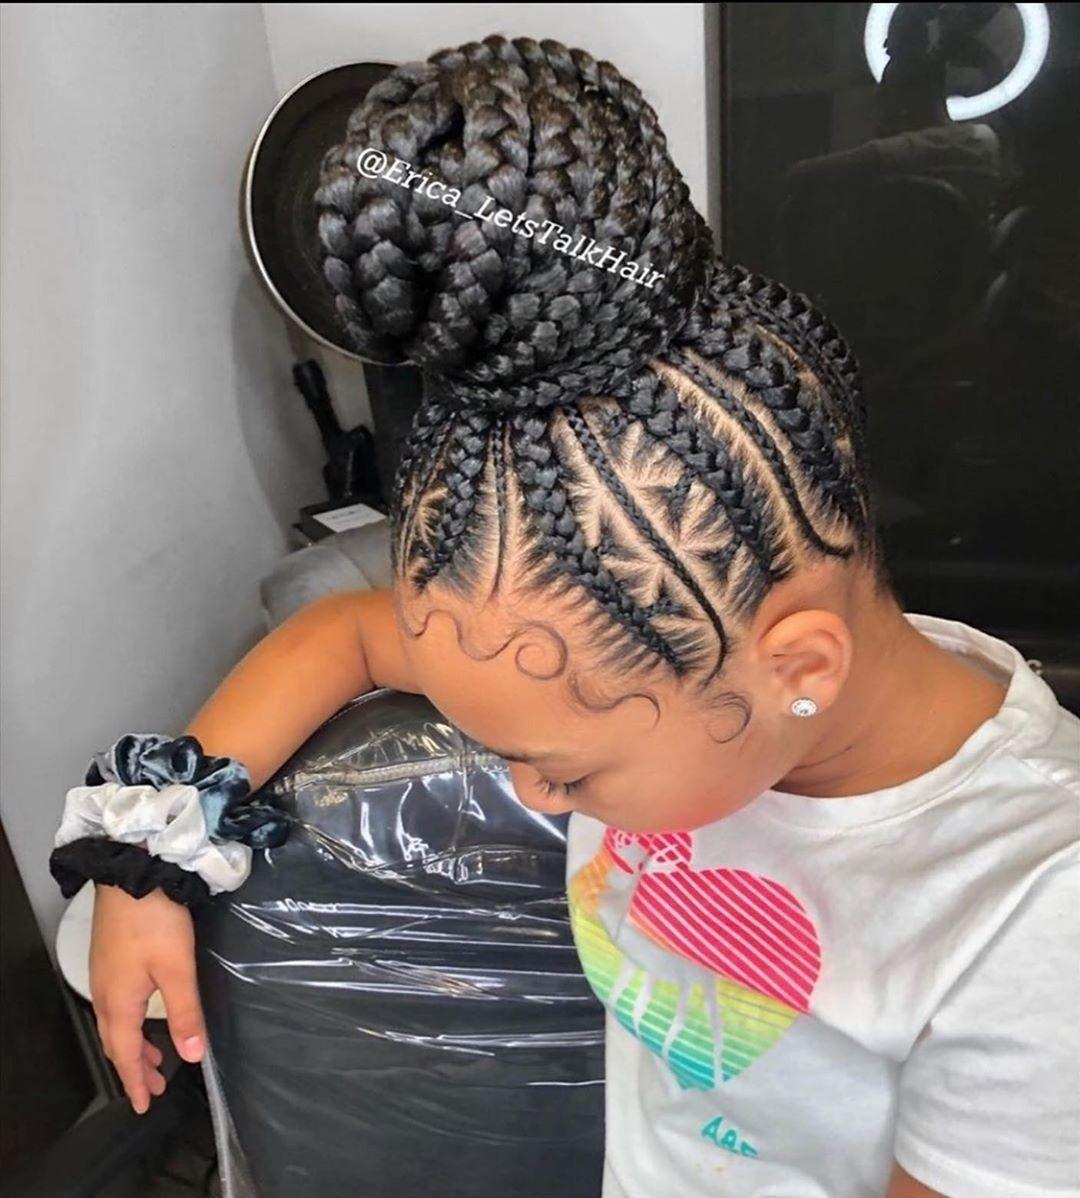 Pin By Shekinah On Braids In 2020 African Hair Braiding Styles African Braids Hairstyles Braided Hairstyles